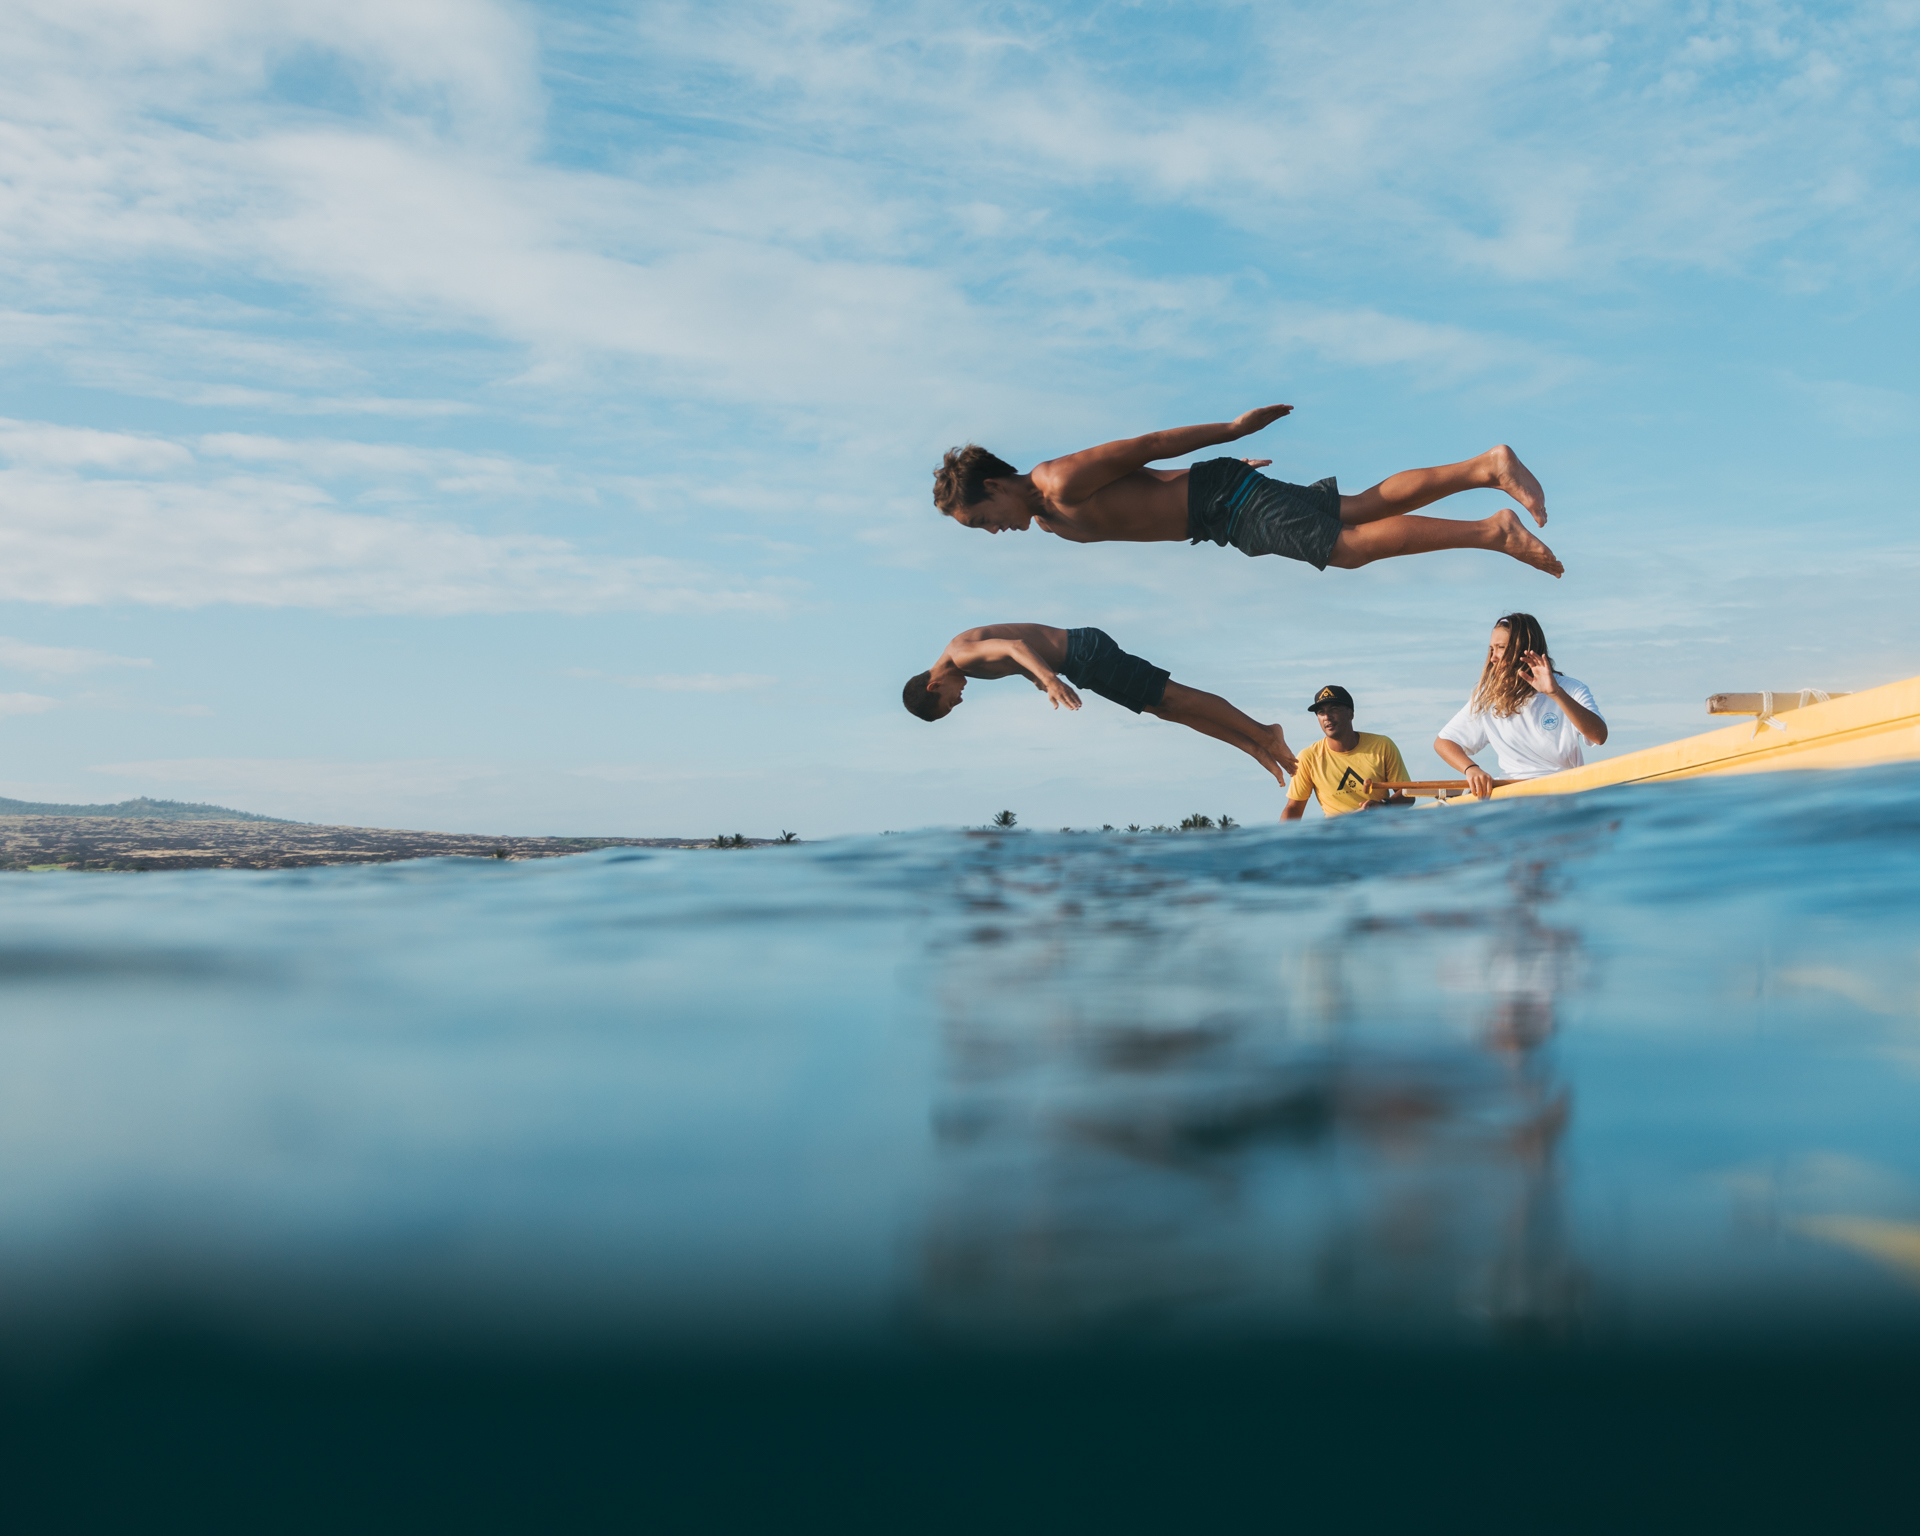 Camp Manitou at Four Seasons Hualalai Resort Photography by Sarah Lee